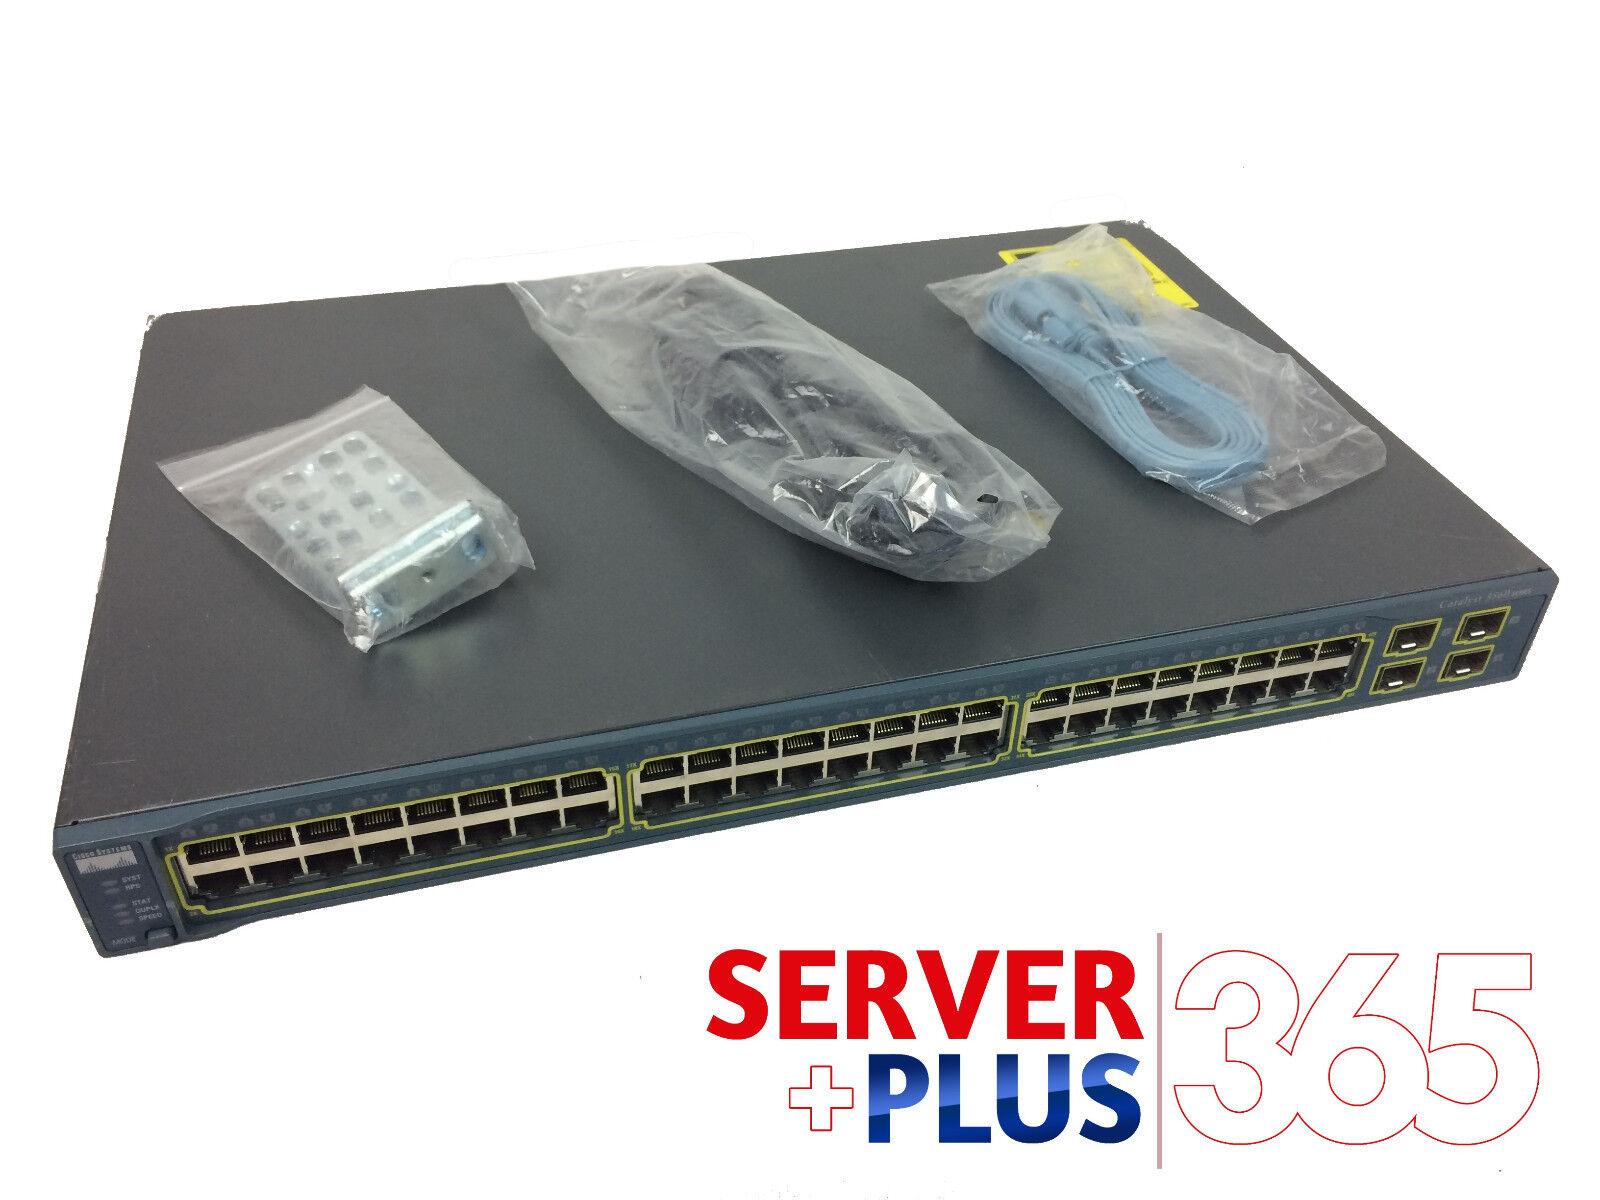 4 SFP POE Switch 15.0 IOS CISCO WS-C3750V2-48PS-S 48 Ethernet 10//100 ports